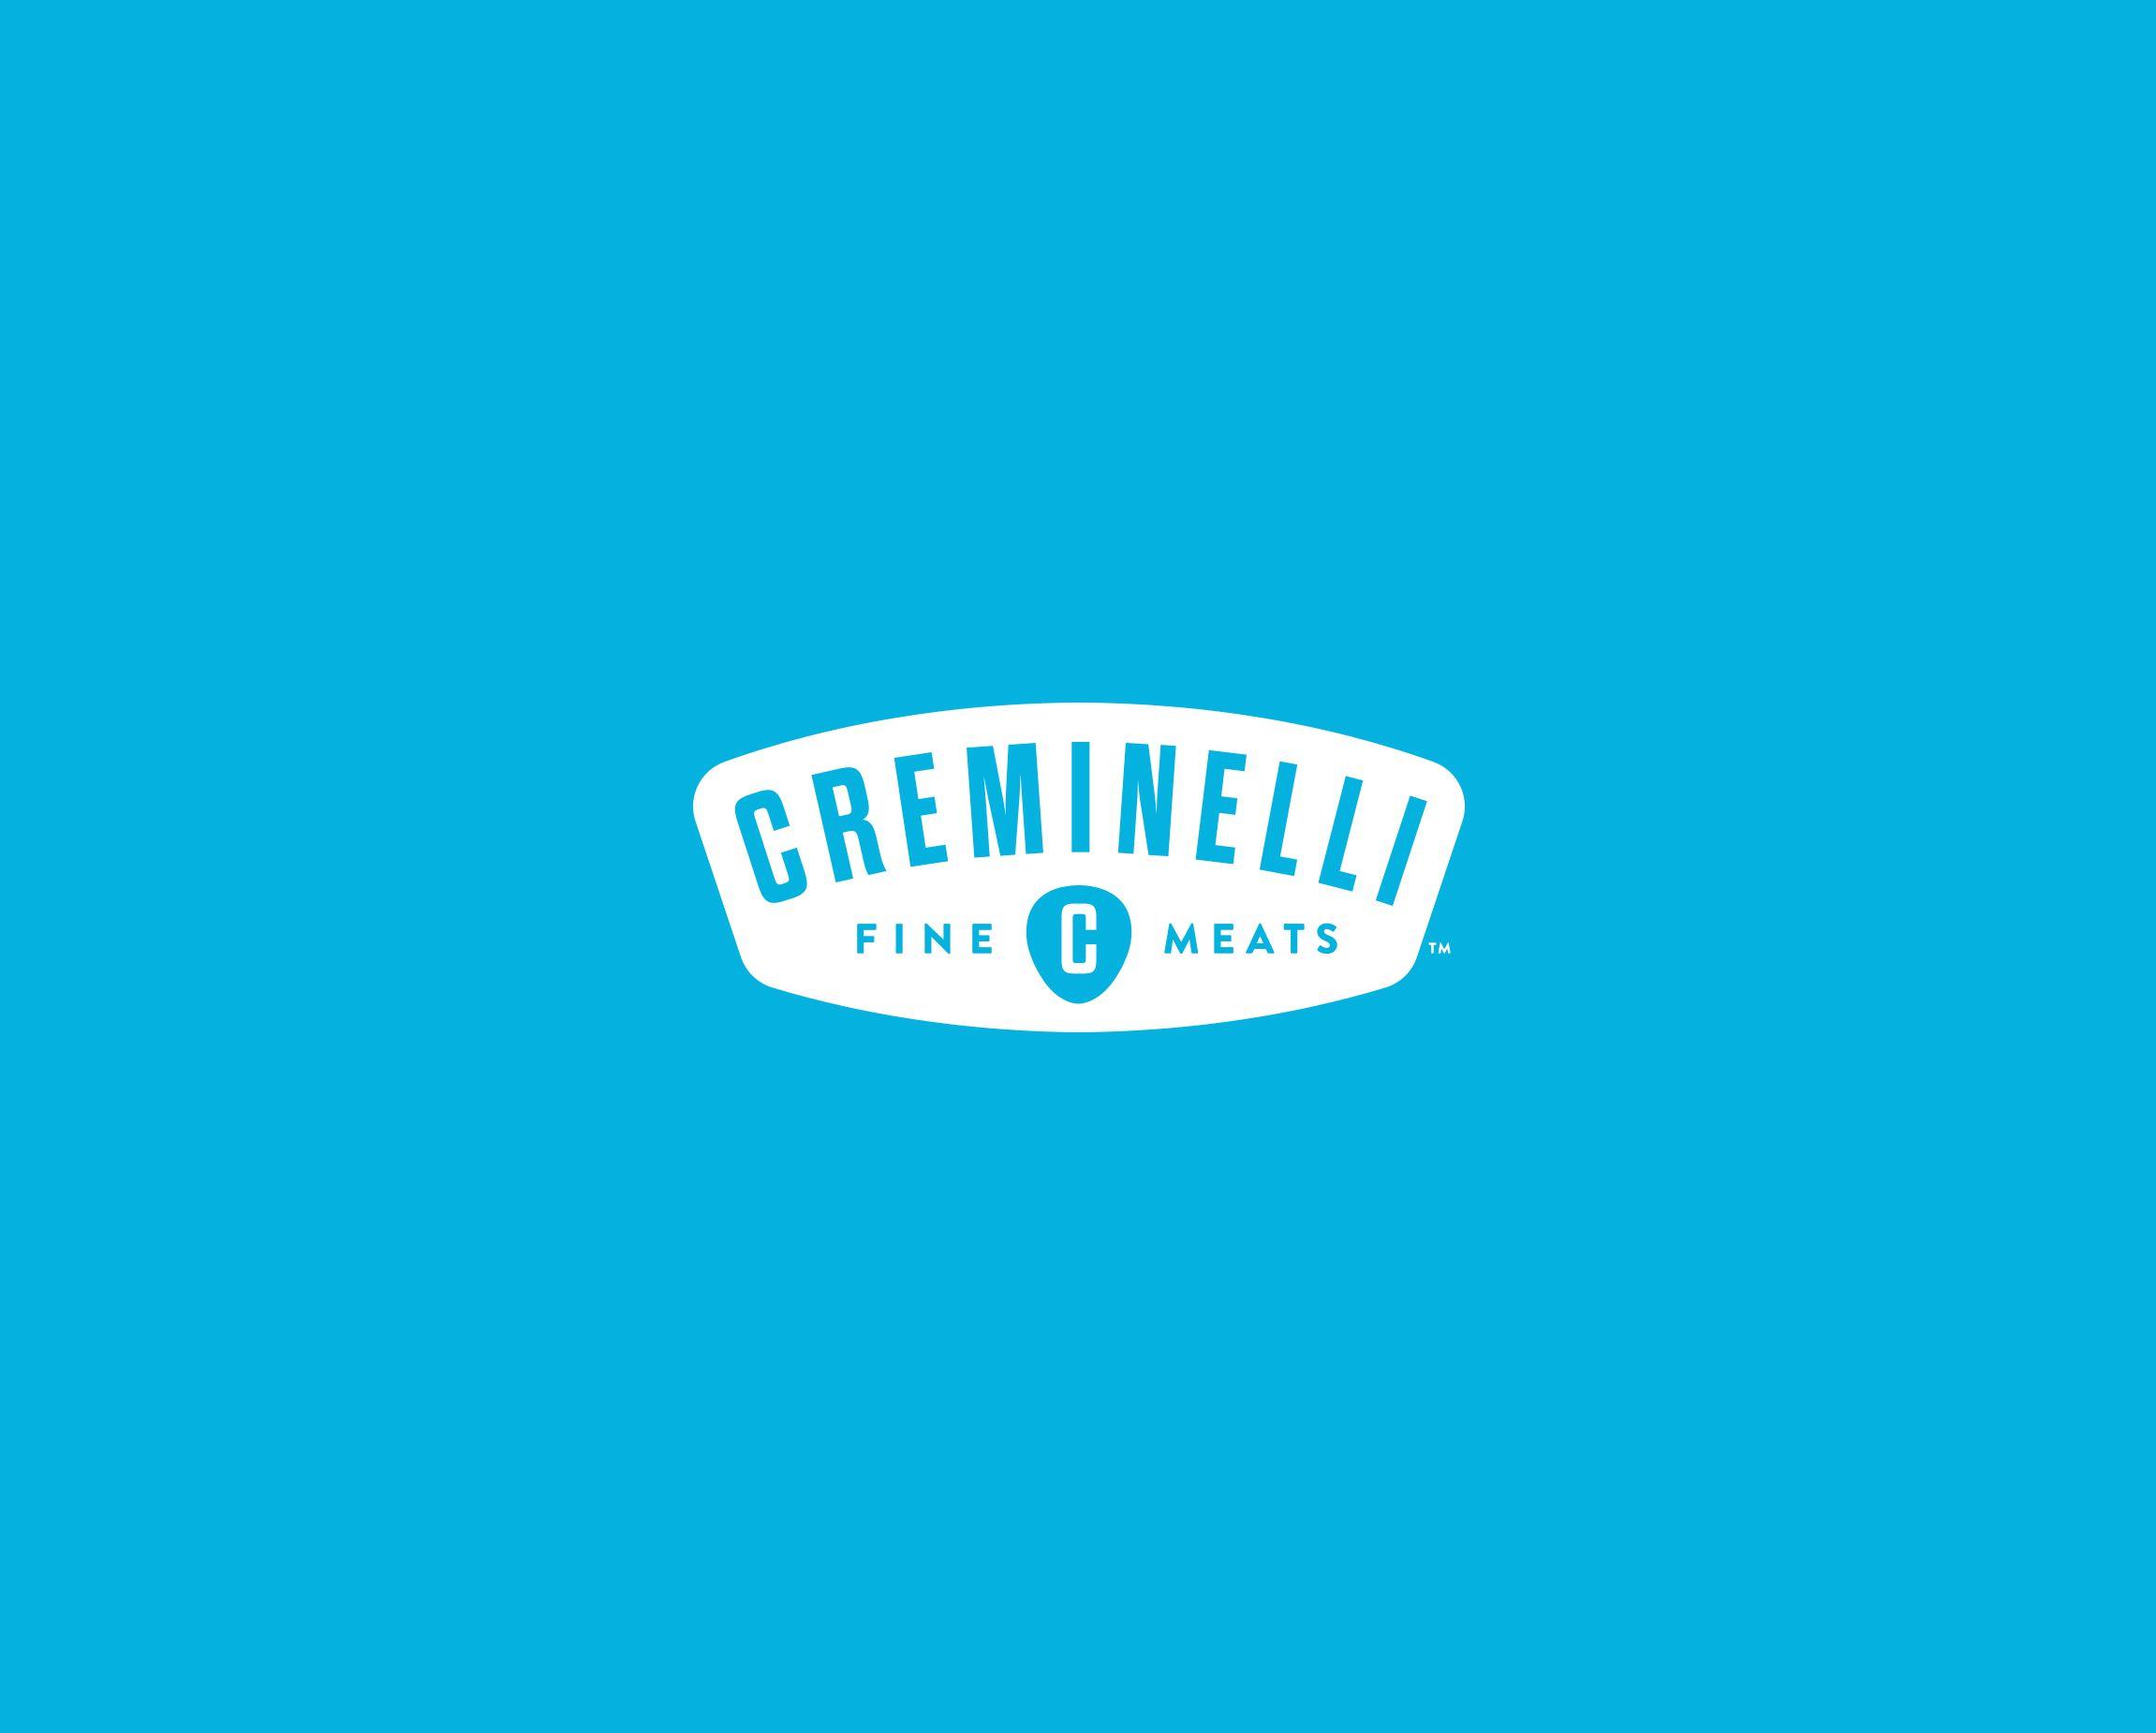 Creminelli Fine Meats logo on blue background